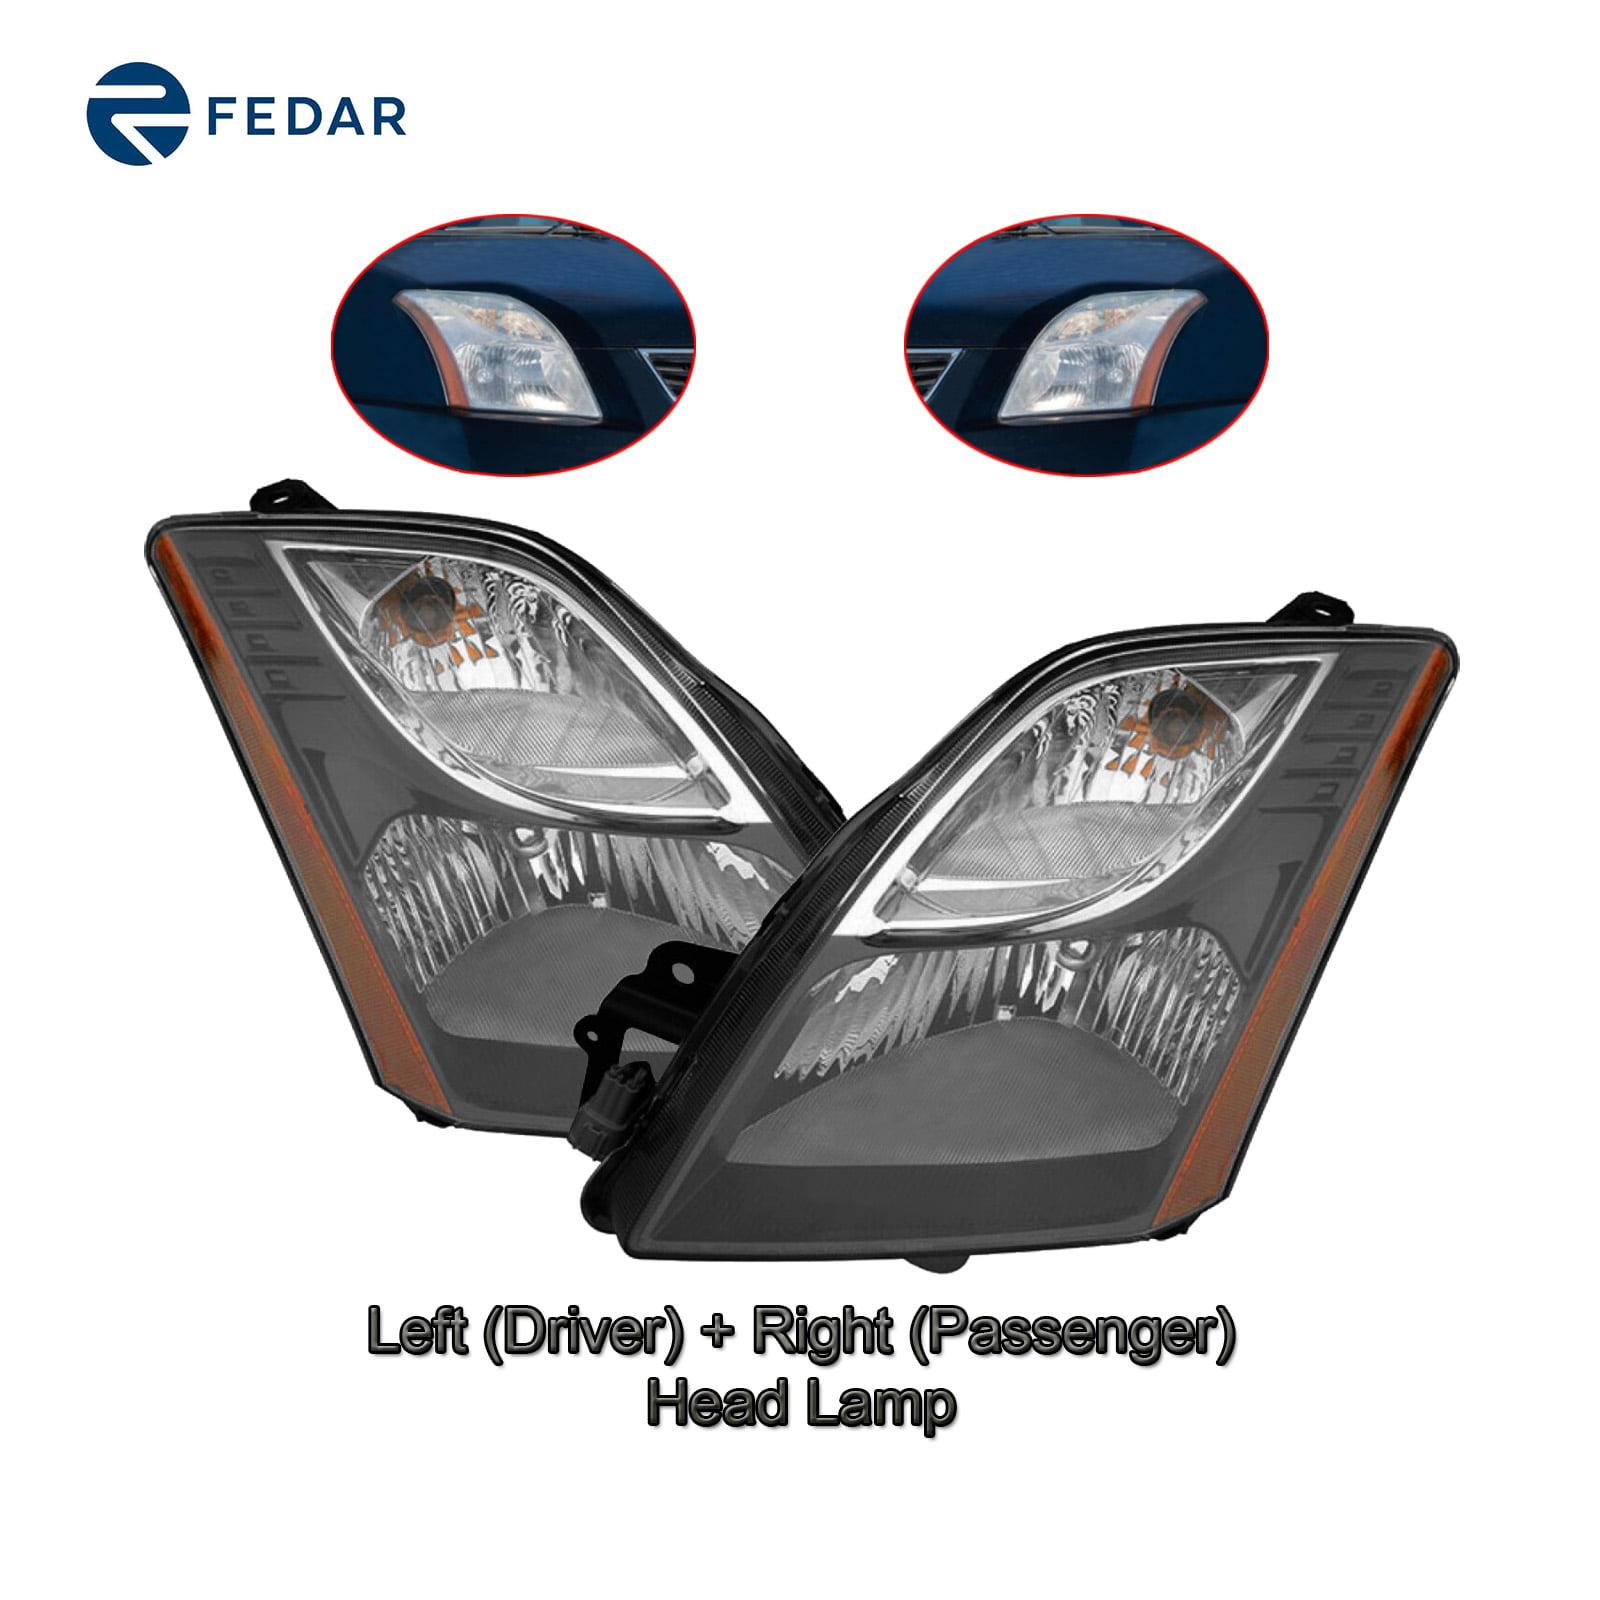 Left Driver Side Head Lamp Headlight For 2010-2011 Nissan Sentra